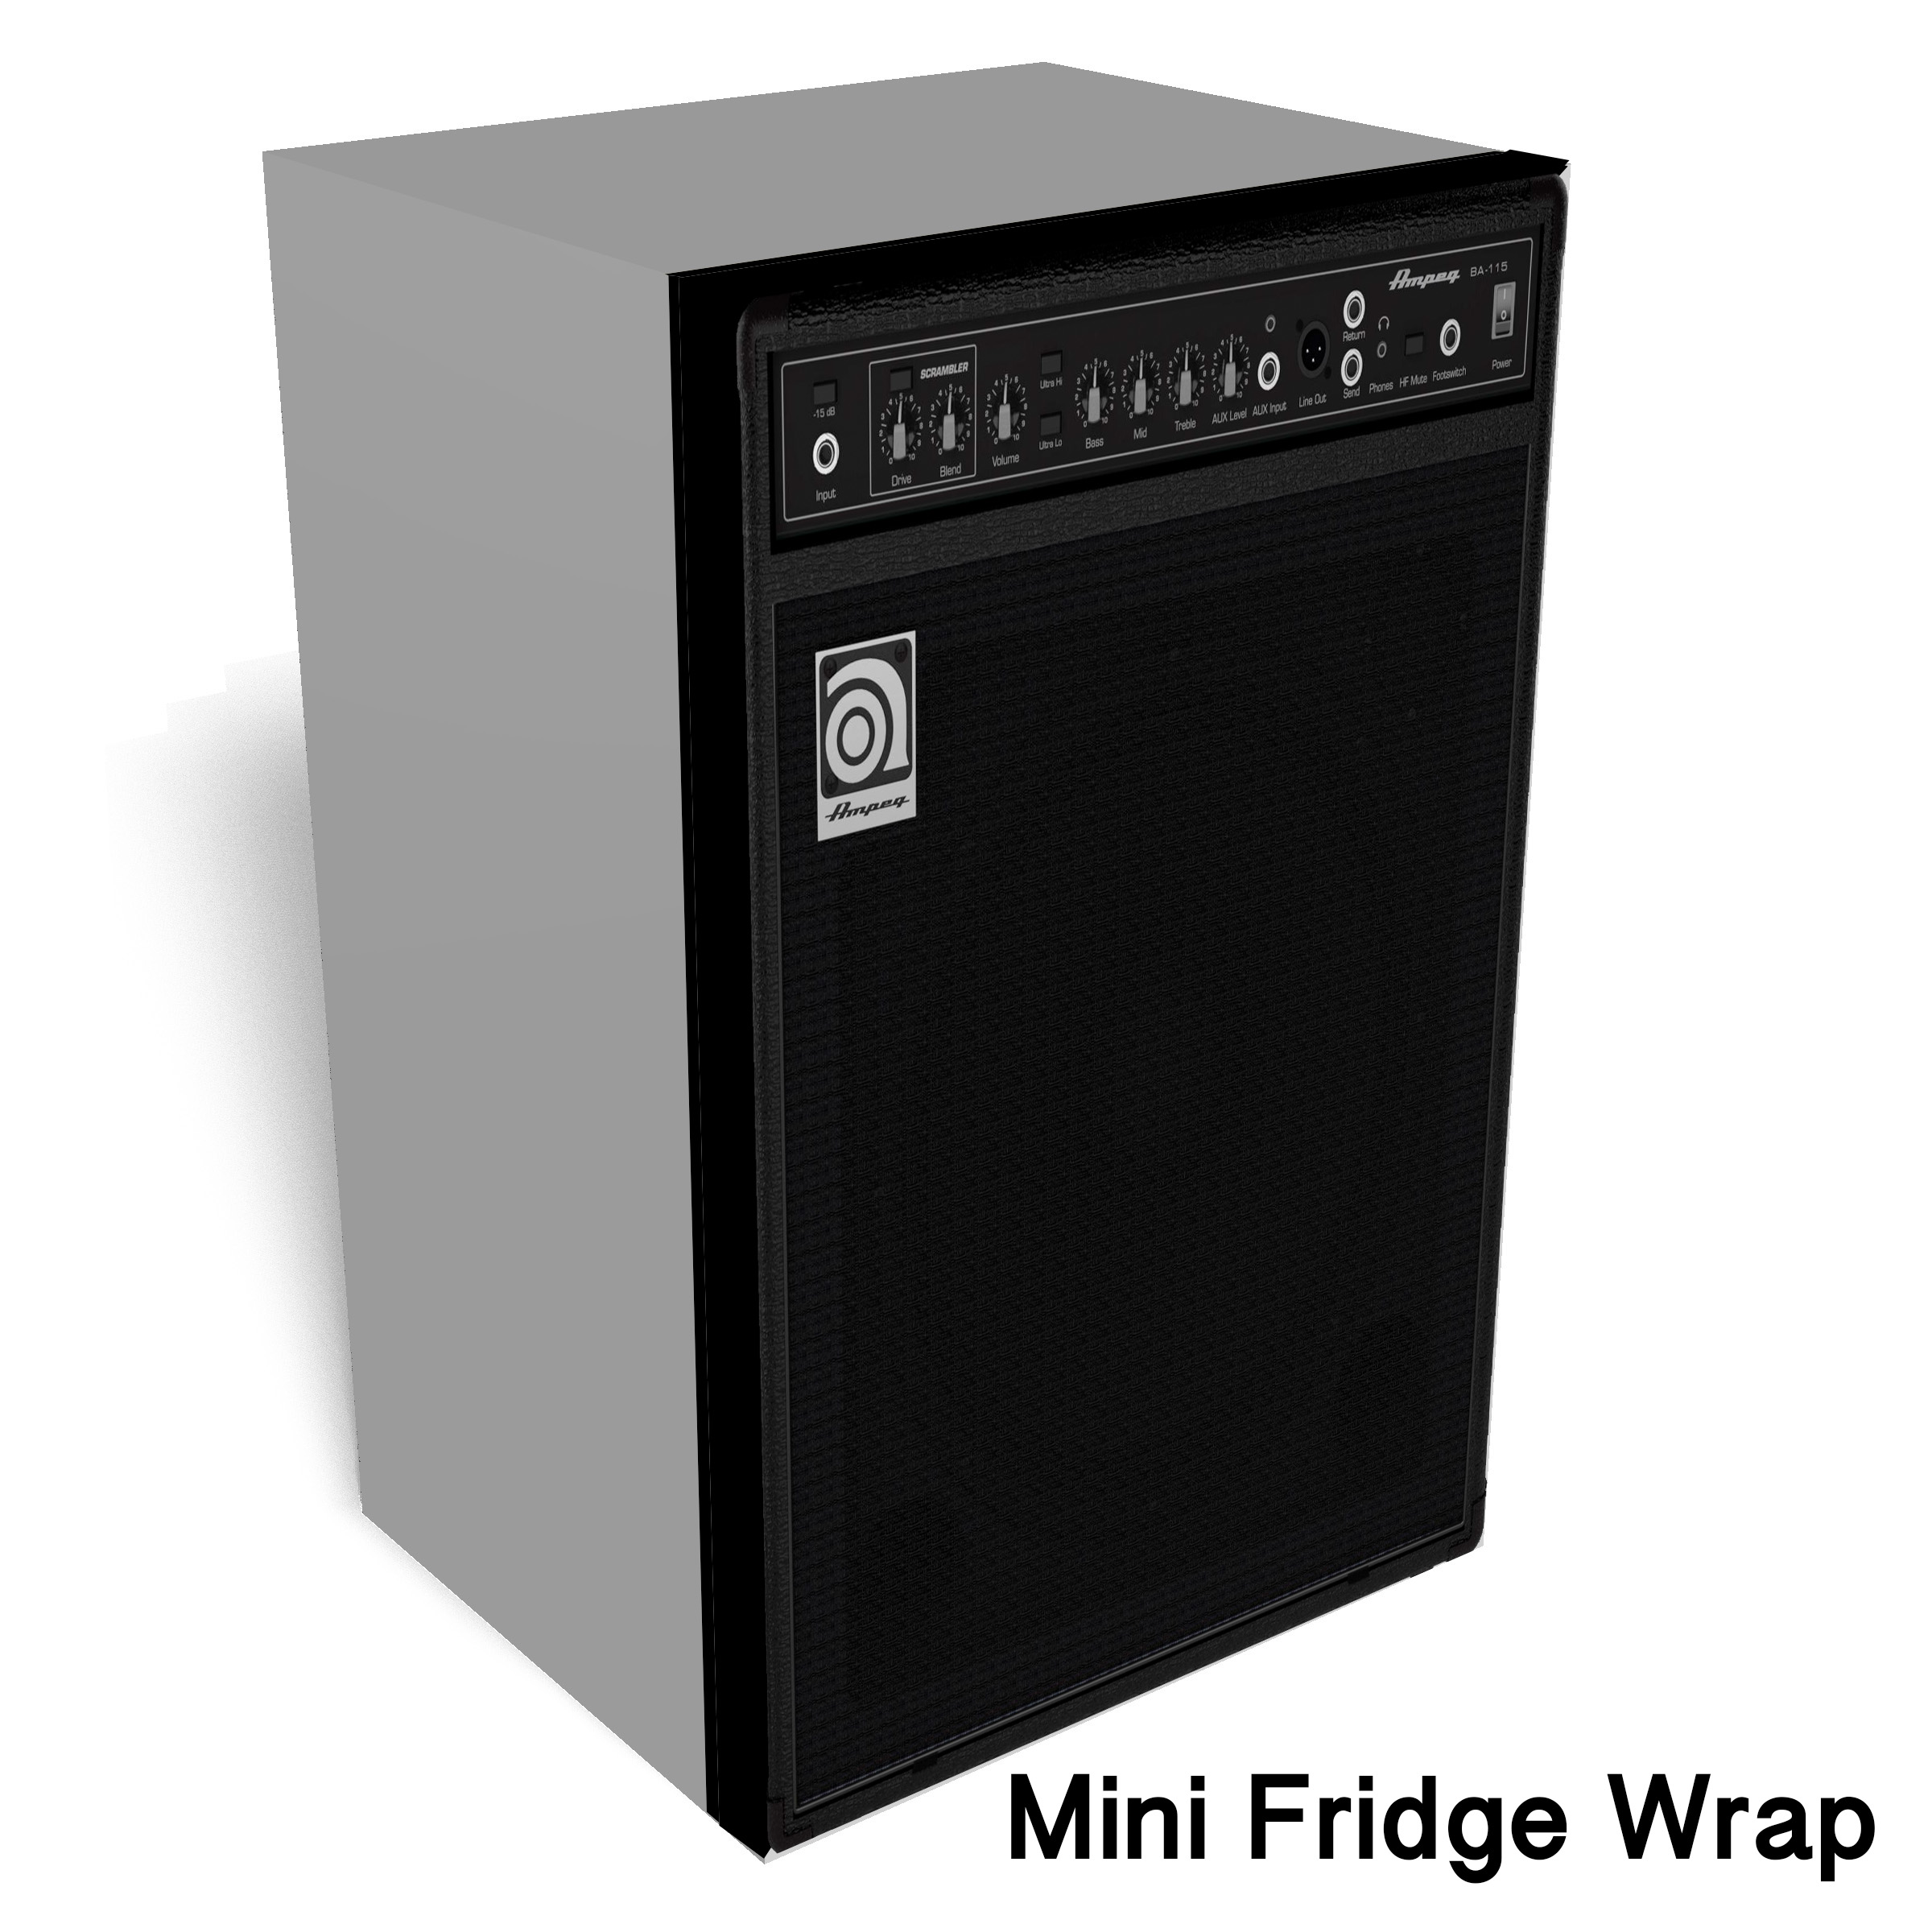 Ampeg Bass Mini Fridge Wrap